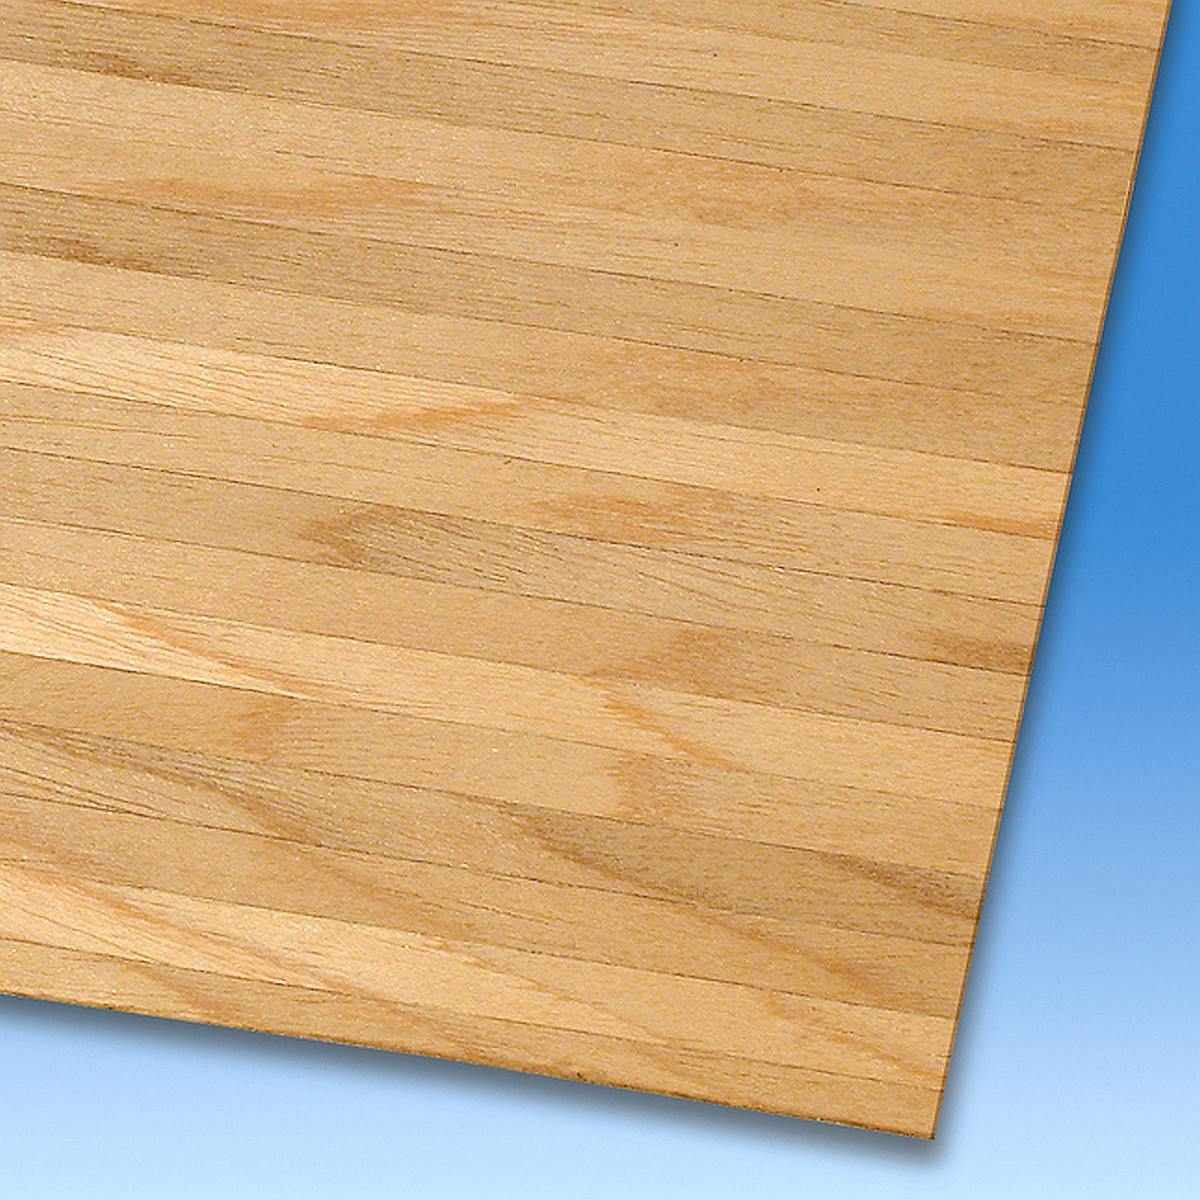 Real wood veneer hall floors